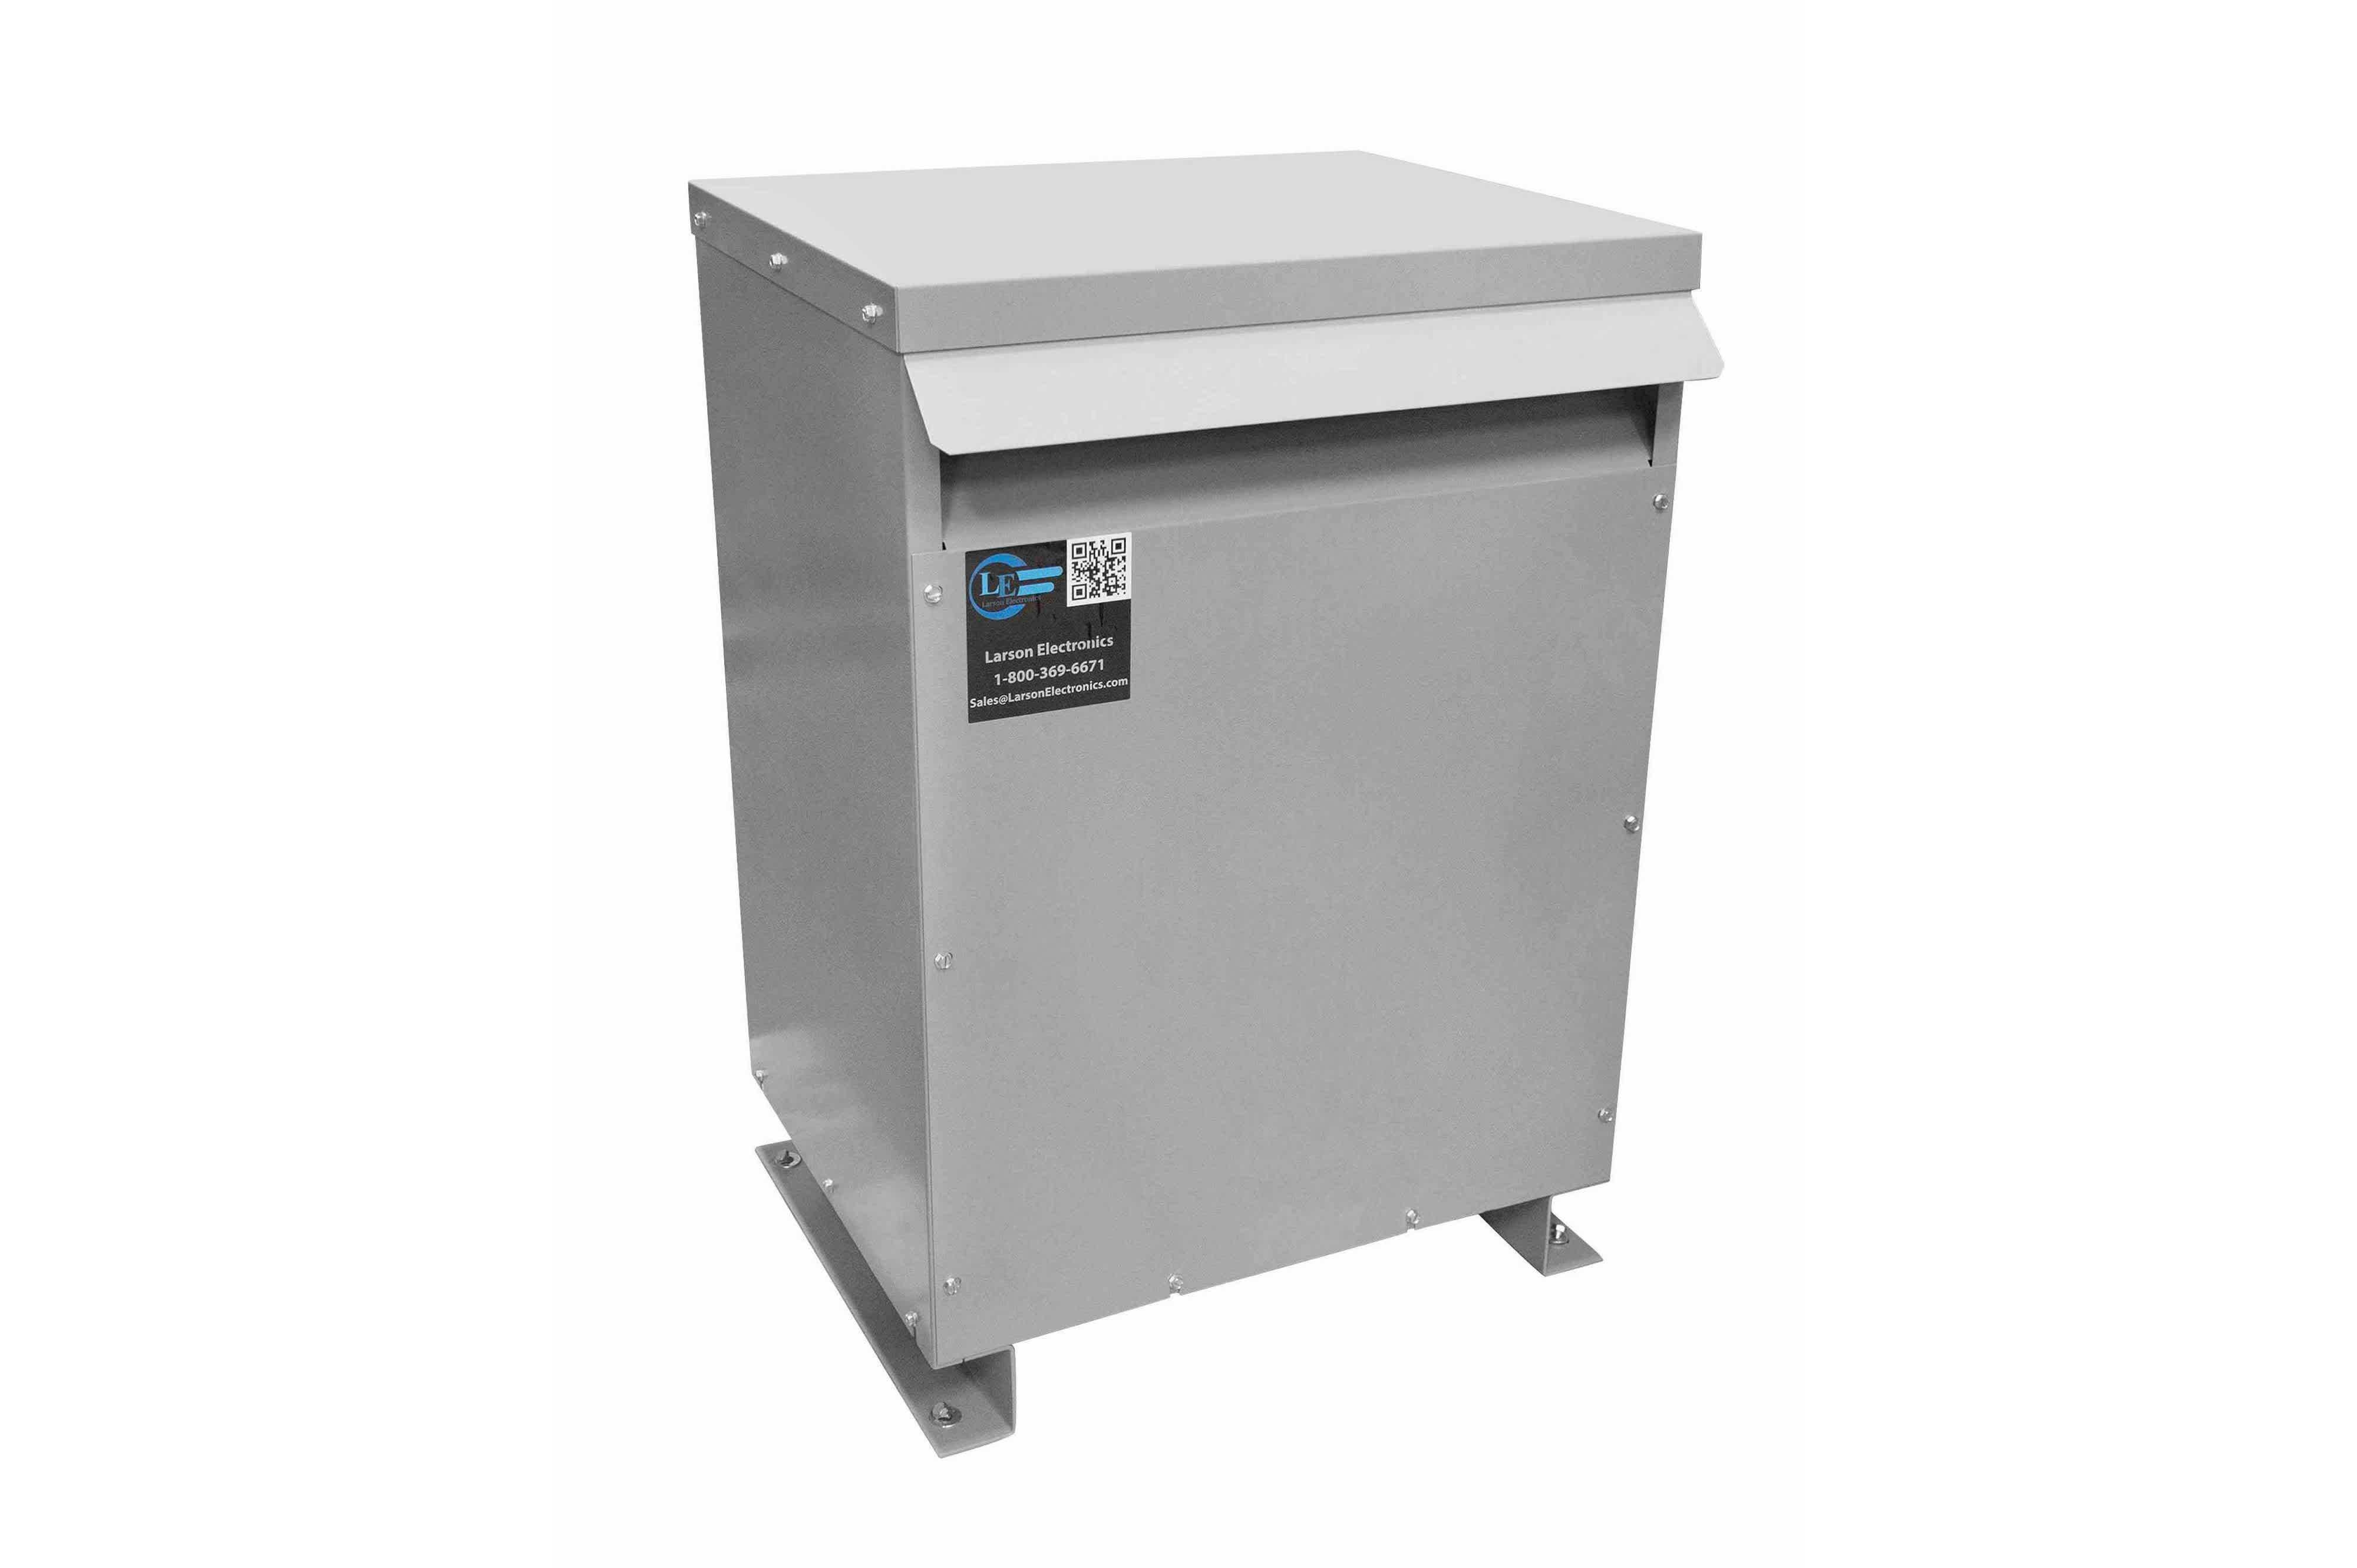 9 kVA 3PH Isolation Transformer, 240V Wye Primary, 480Y/277 Wye-N Secondary, N3R, Ventilated, 60 Hz